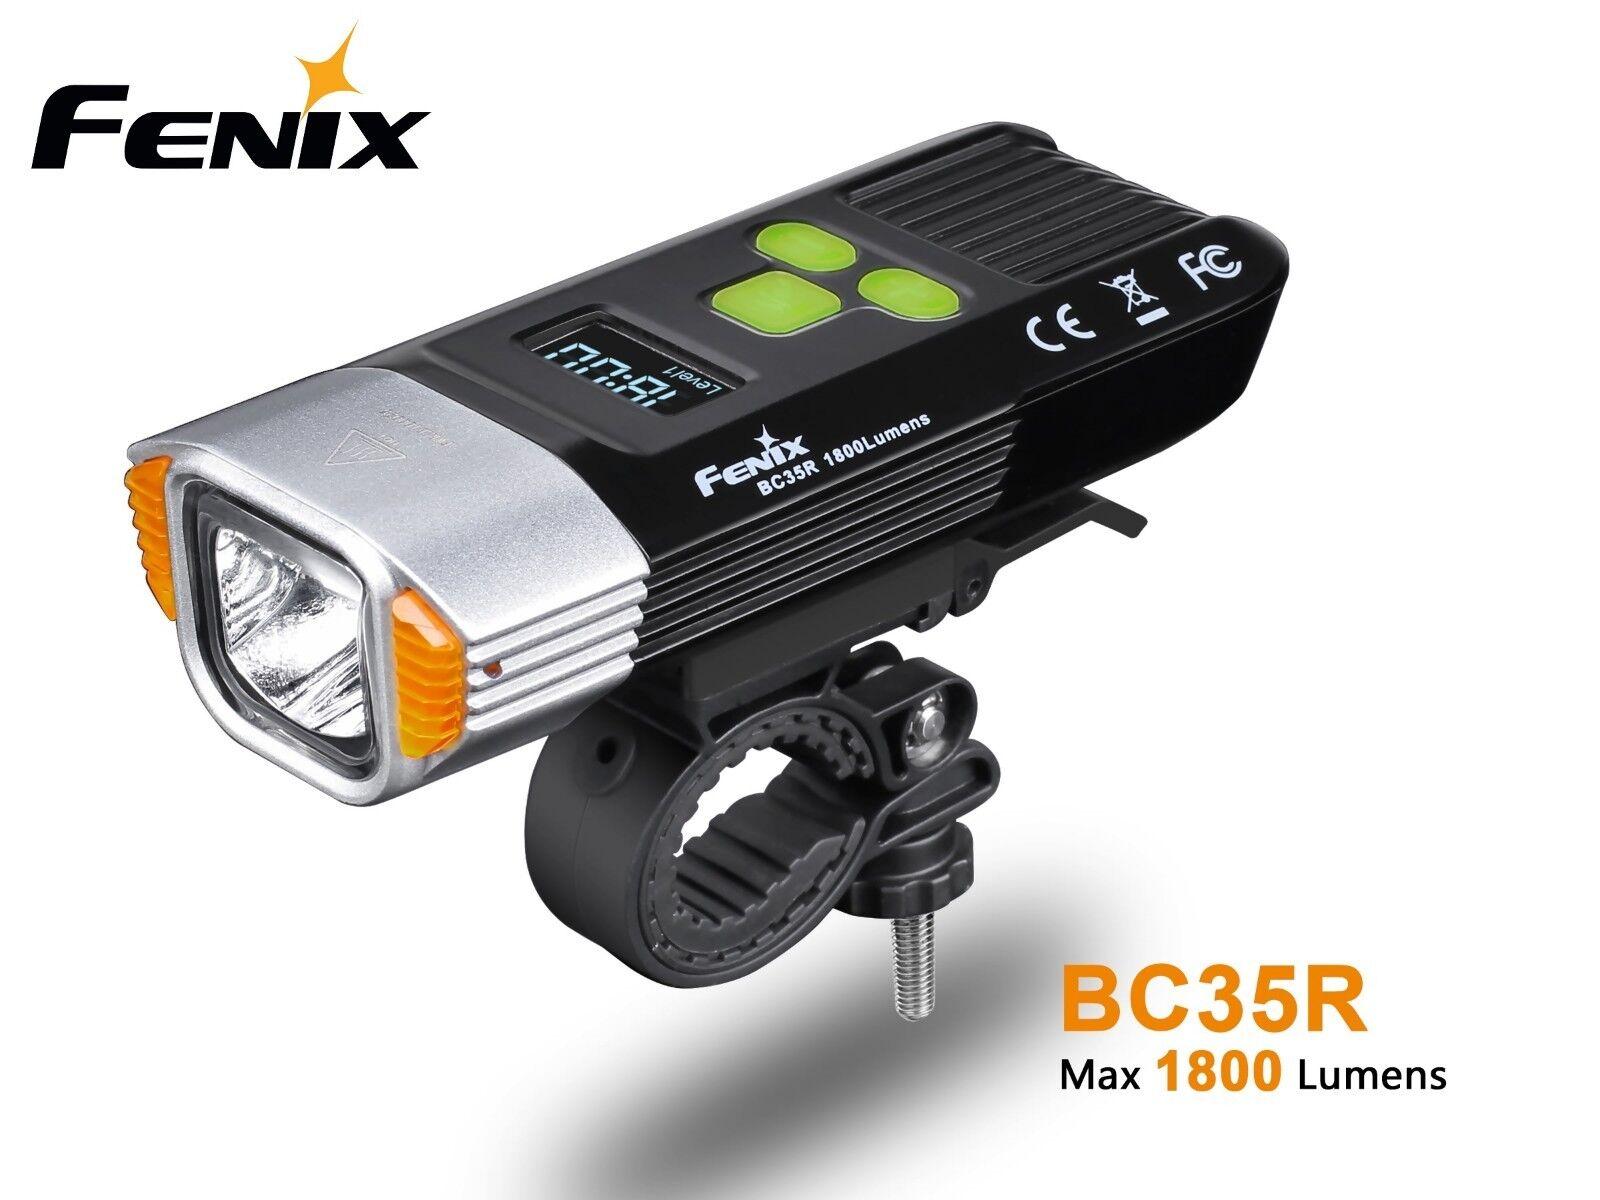 New Fenix BC35R USB Charge Cree XHP50 LED 1800 Lumens Bike Bicycle Flashlight